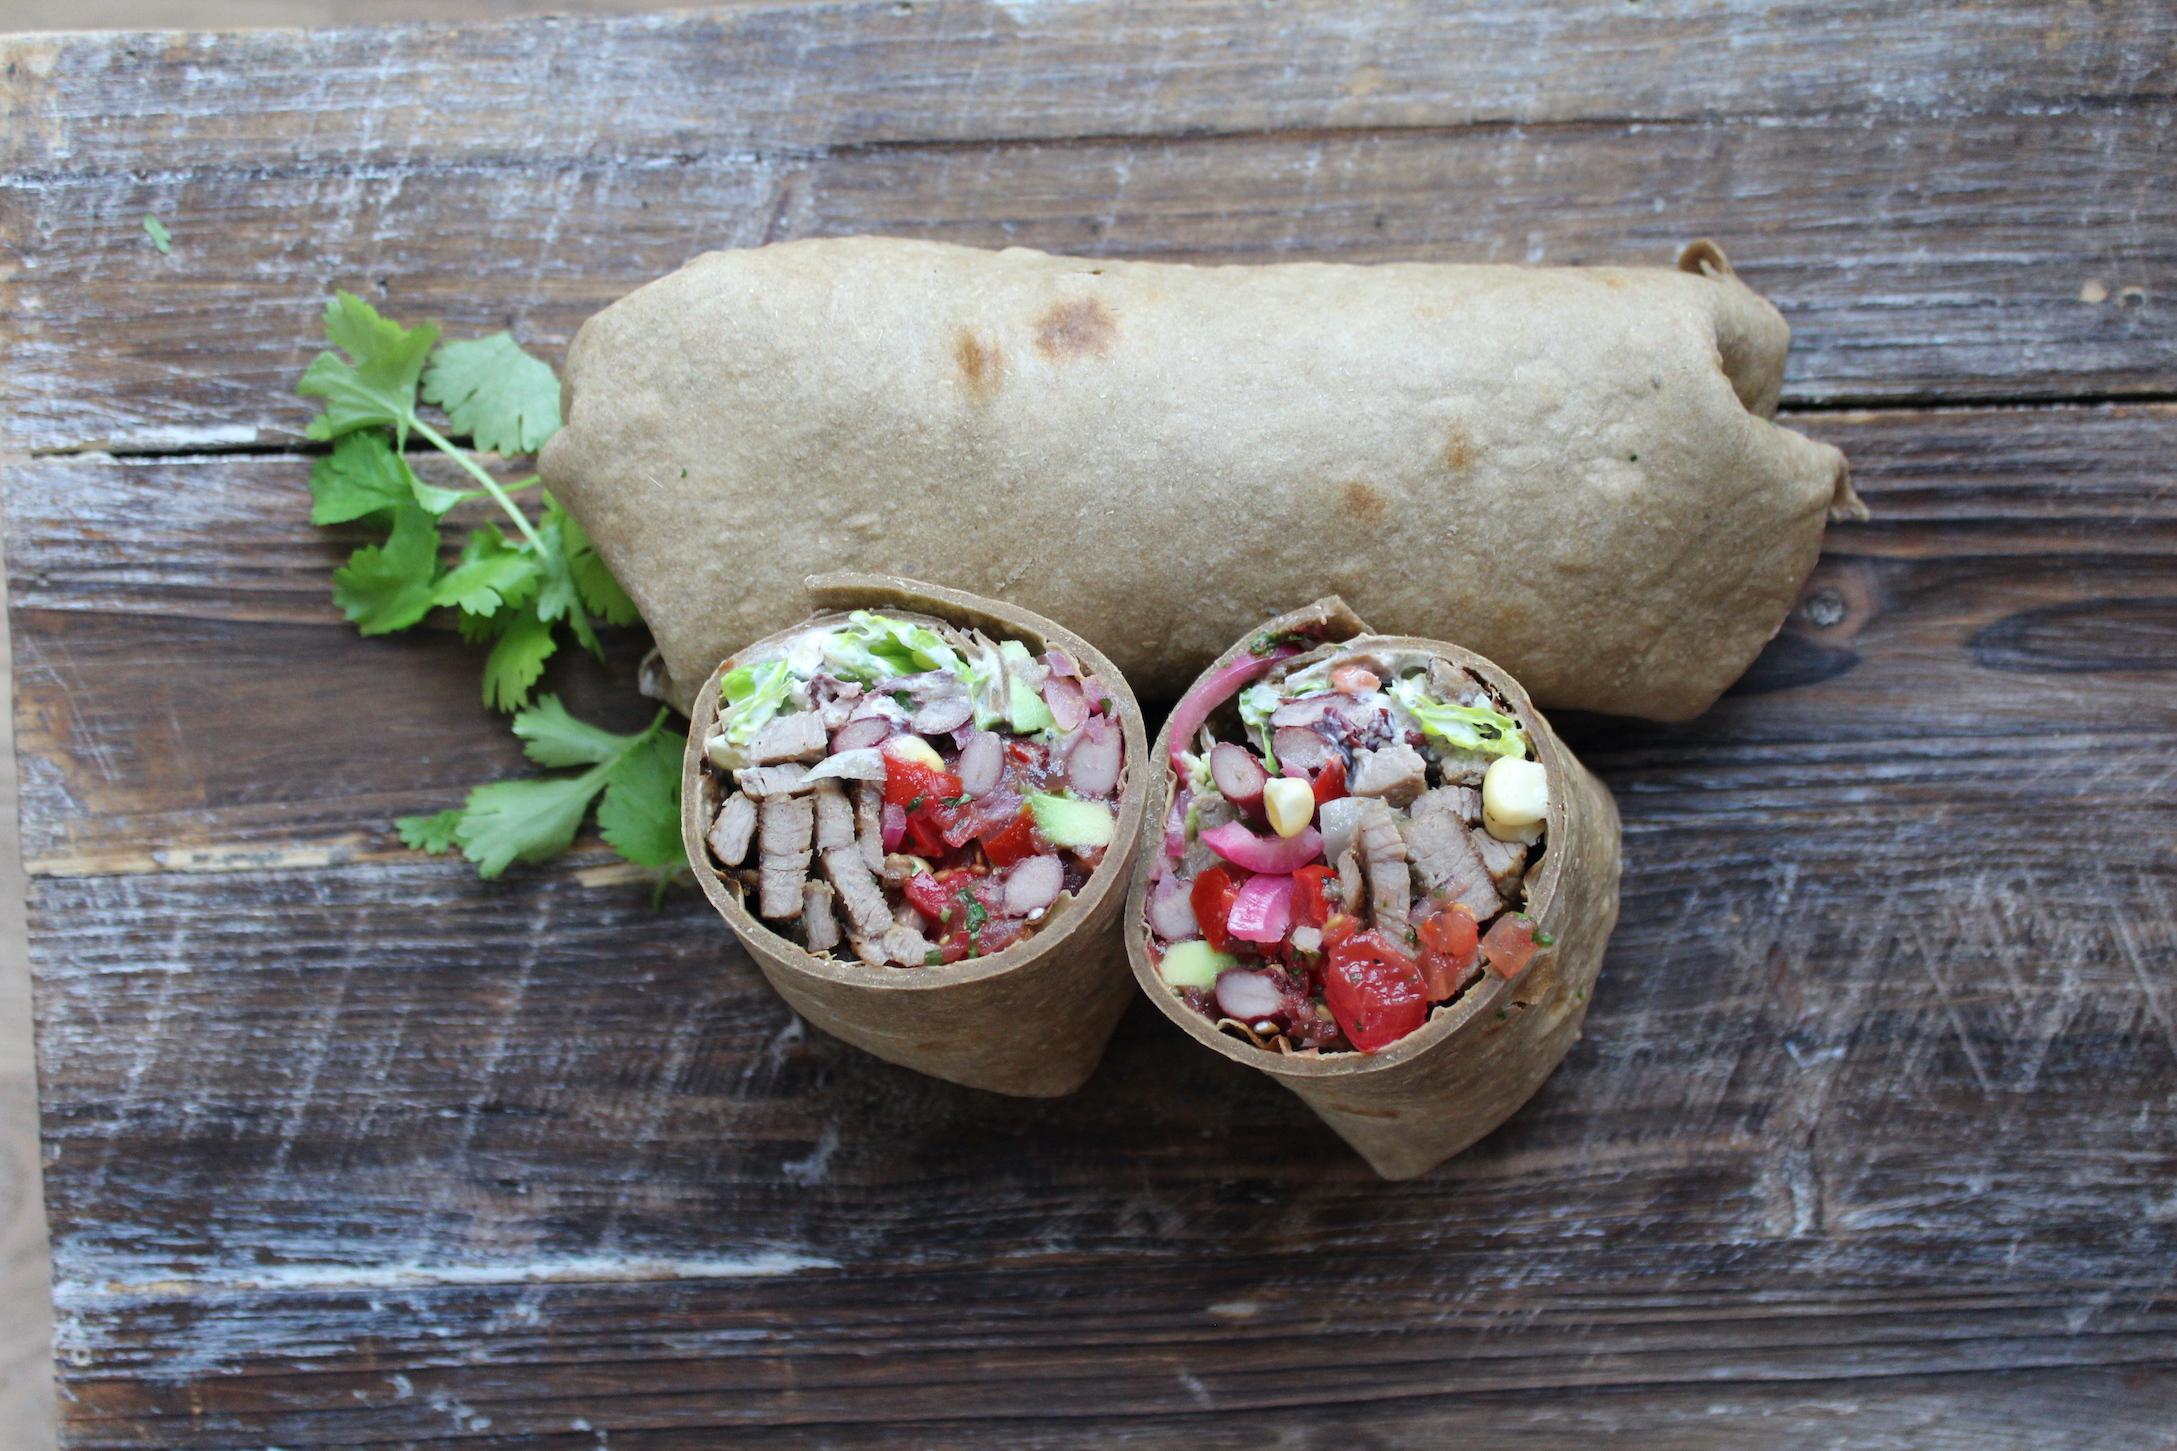 Man cookbook Burrito with Super Grain Flour from IPA